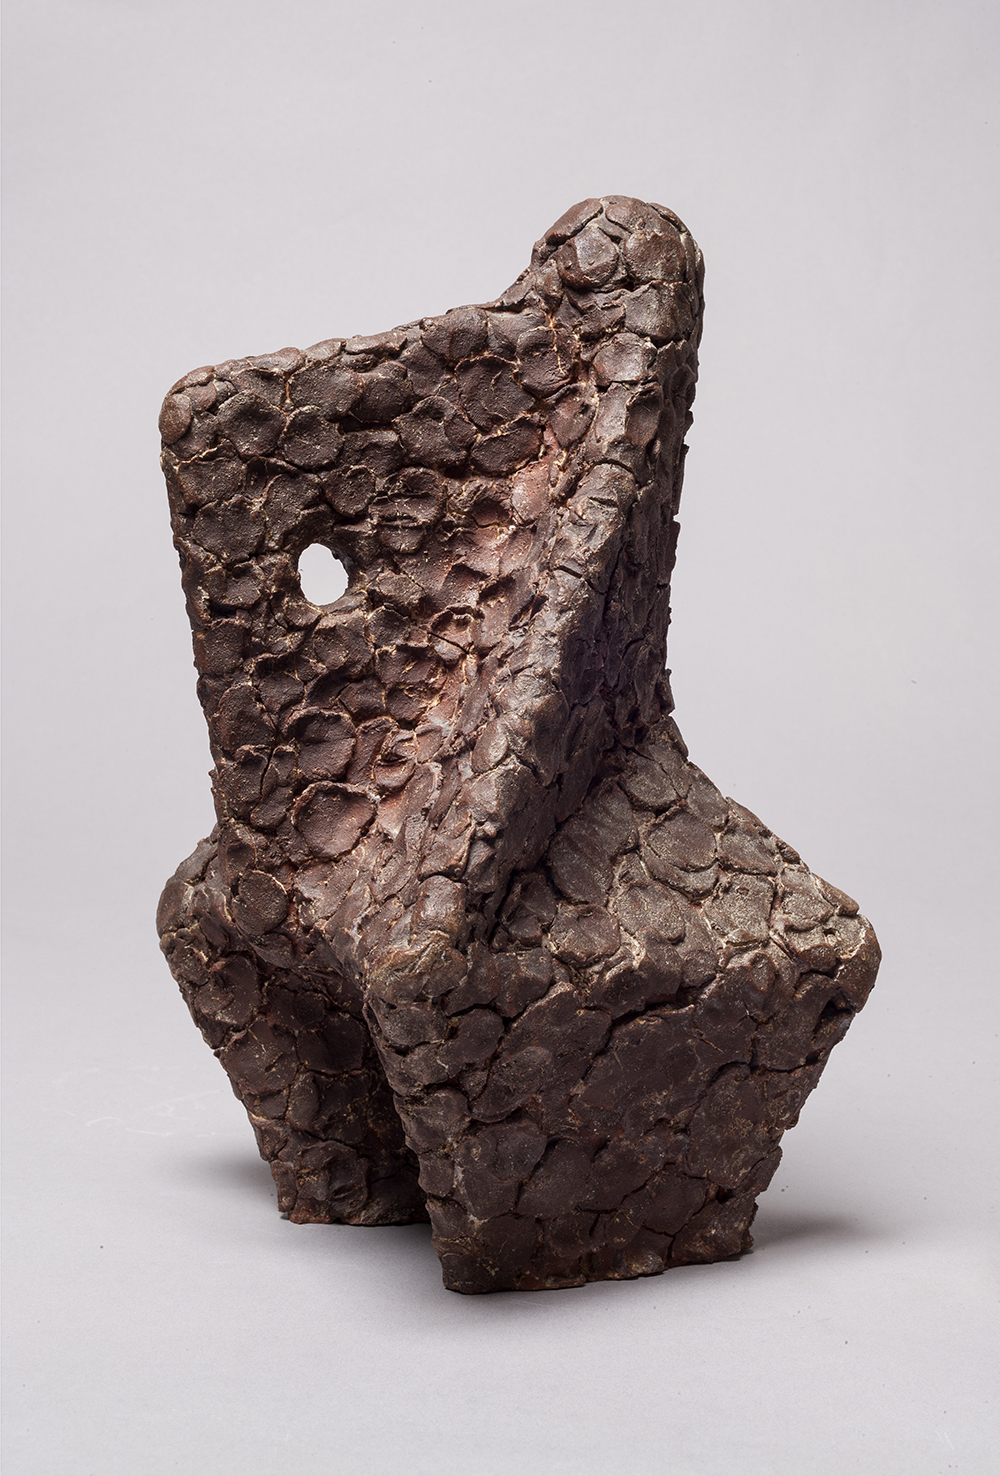 Sonja Ferlov Mancoba, Skulptur, 1959. Statens Museum for Kunst.